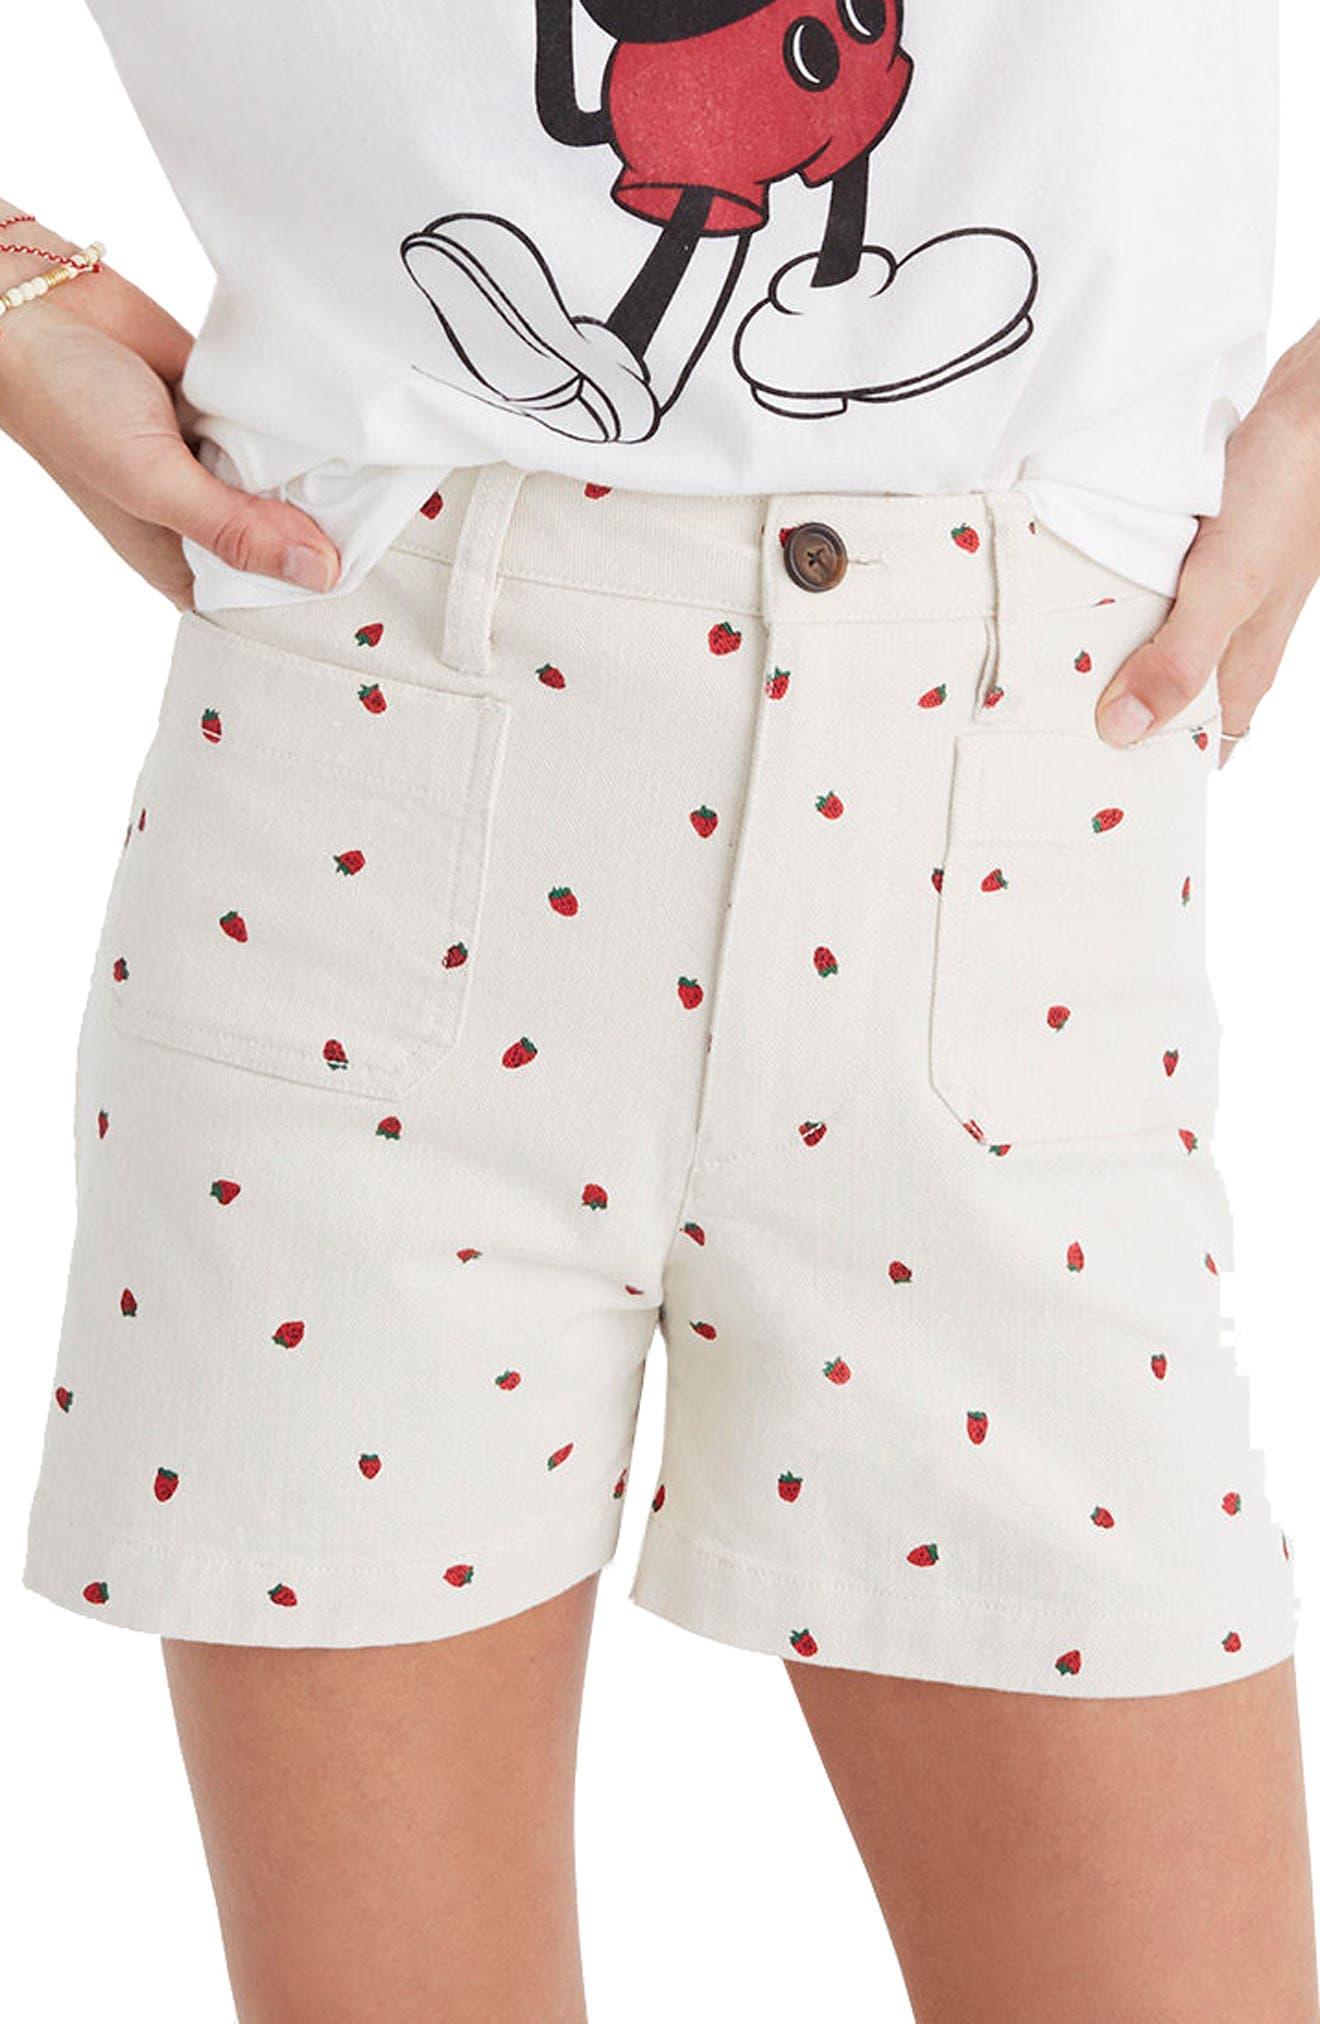 Emmett Fresh Strawberries Shorts,                             Main thumbnail 1, color,                             Strawberry Distressed Stone